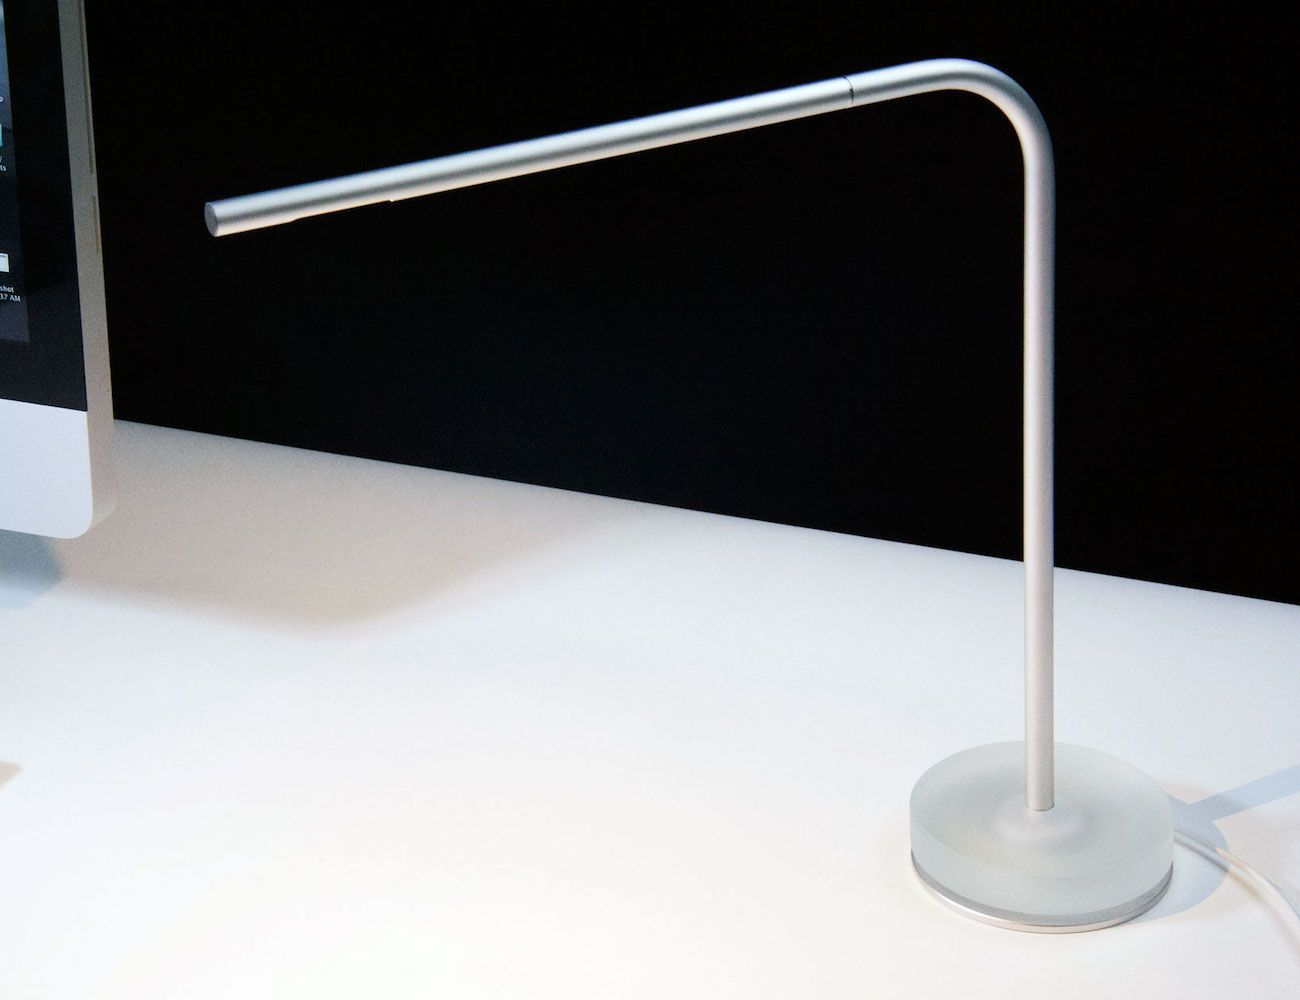 Manifold Piccolo USB Desk Lamp  Gadget Flow